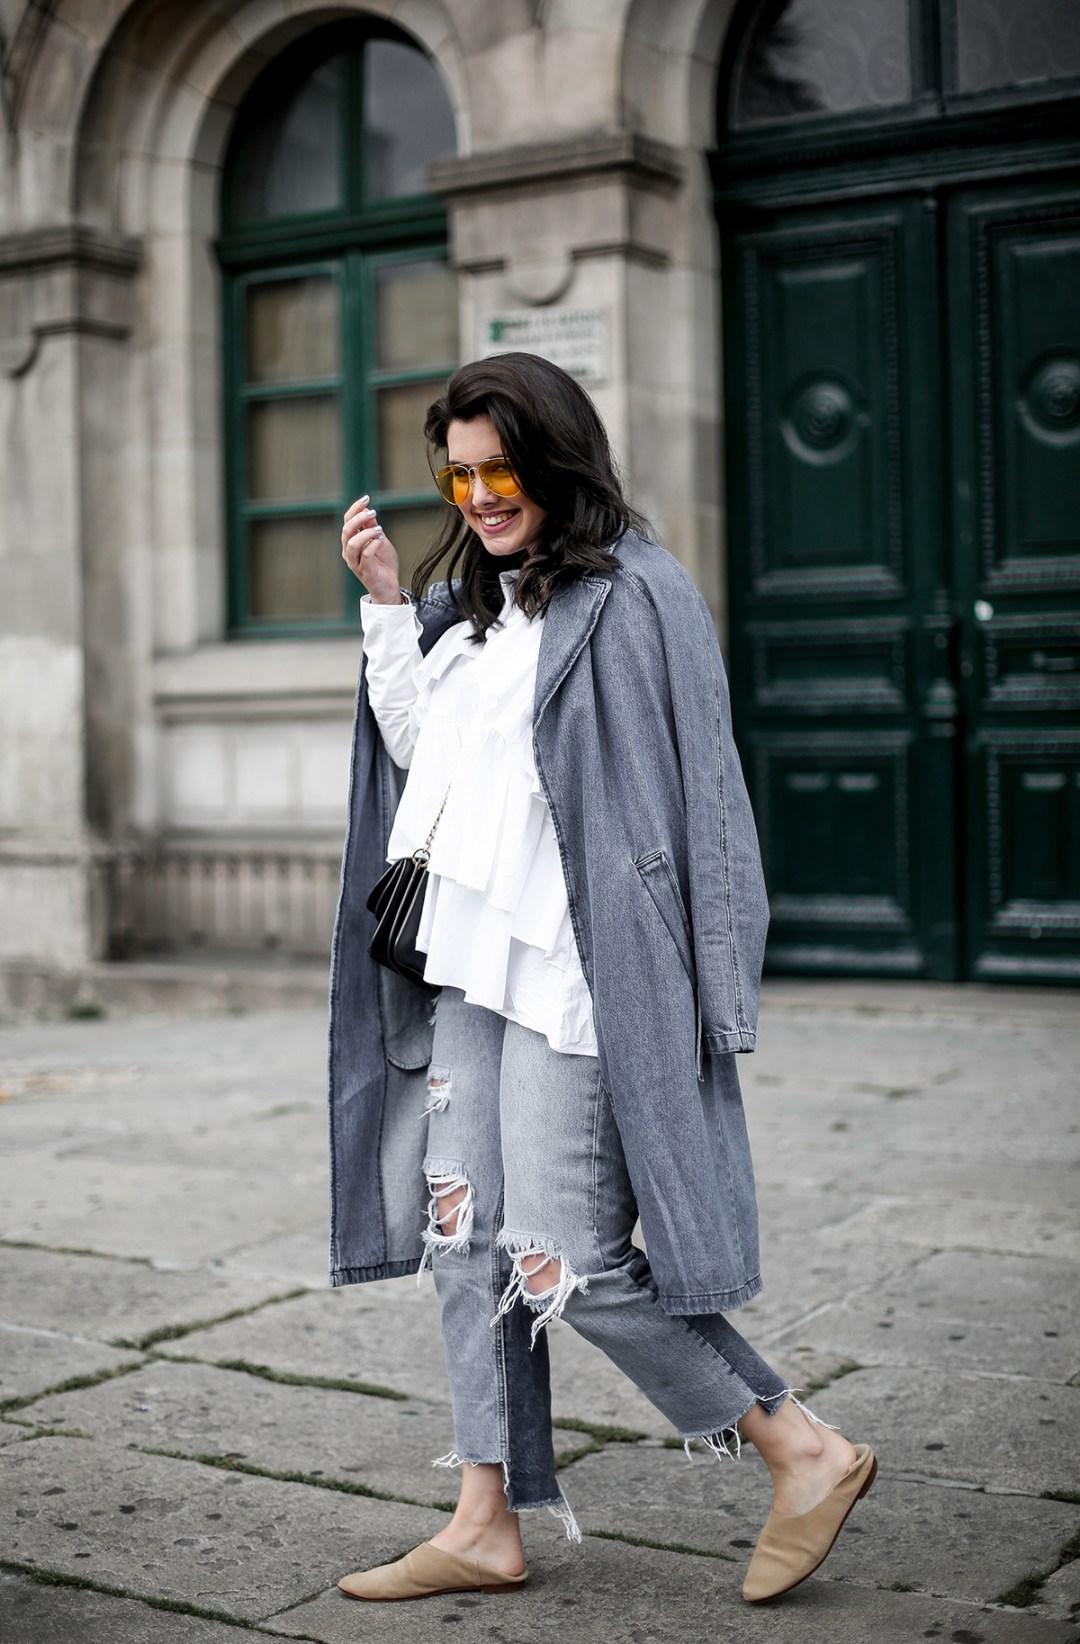 trench-denim-ripped-jeans-ruffle-blouse-zara-streetstyle12